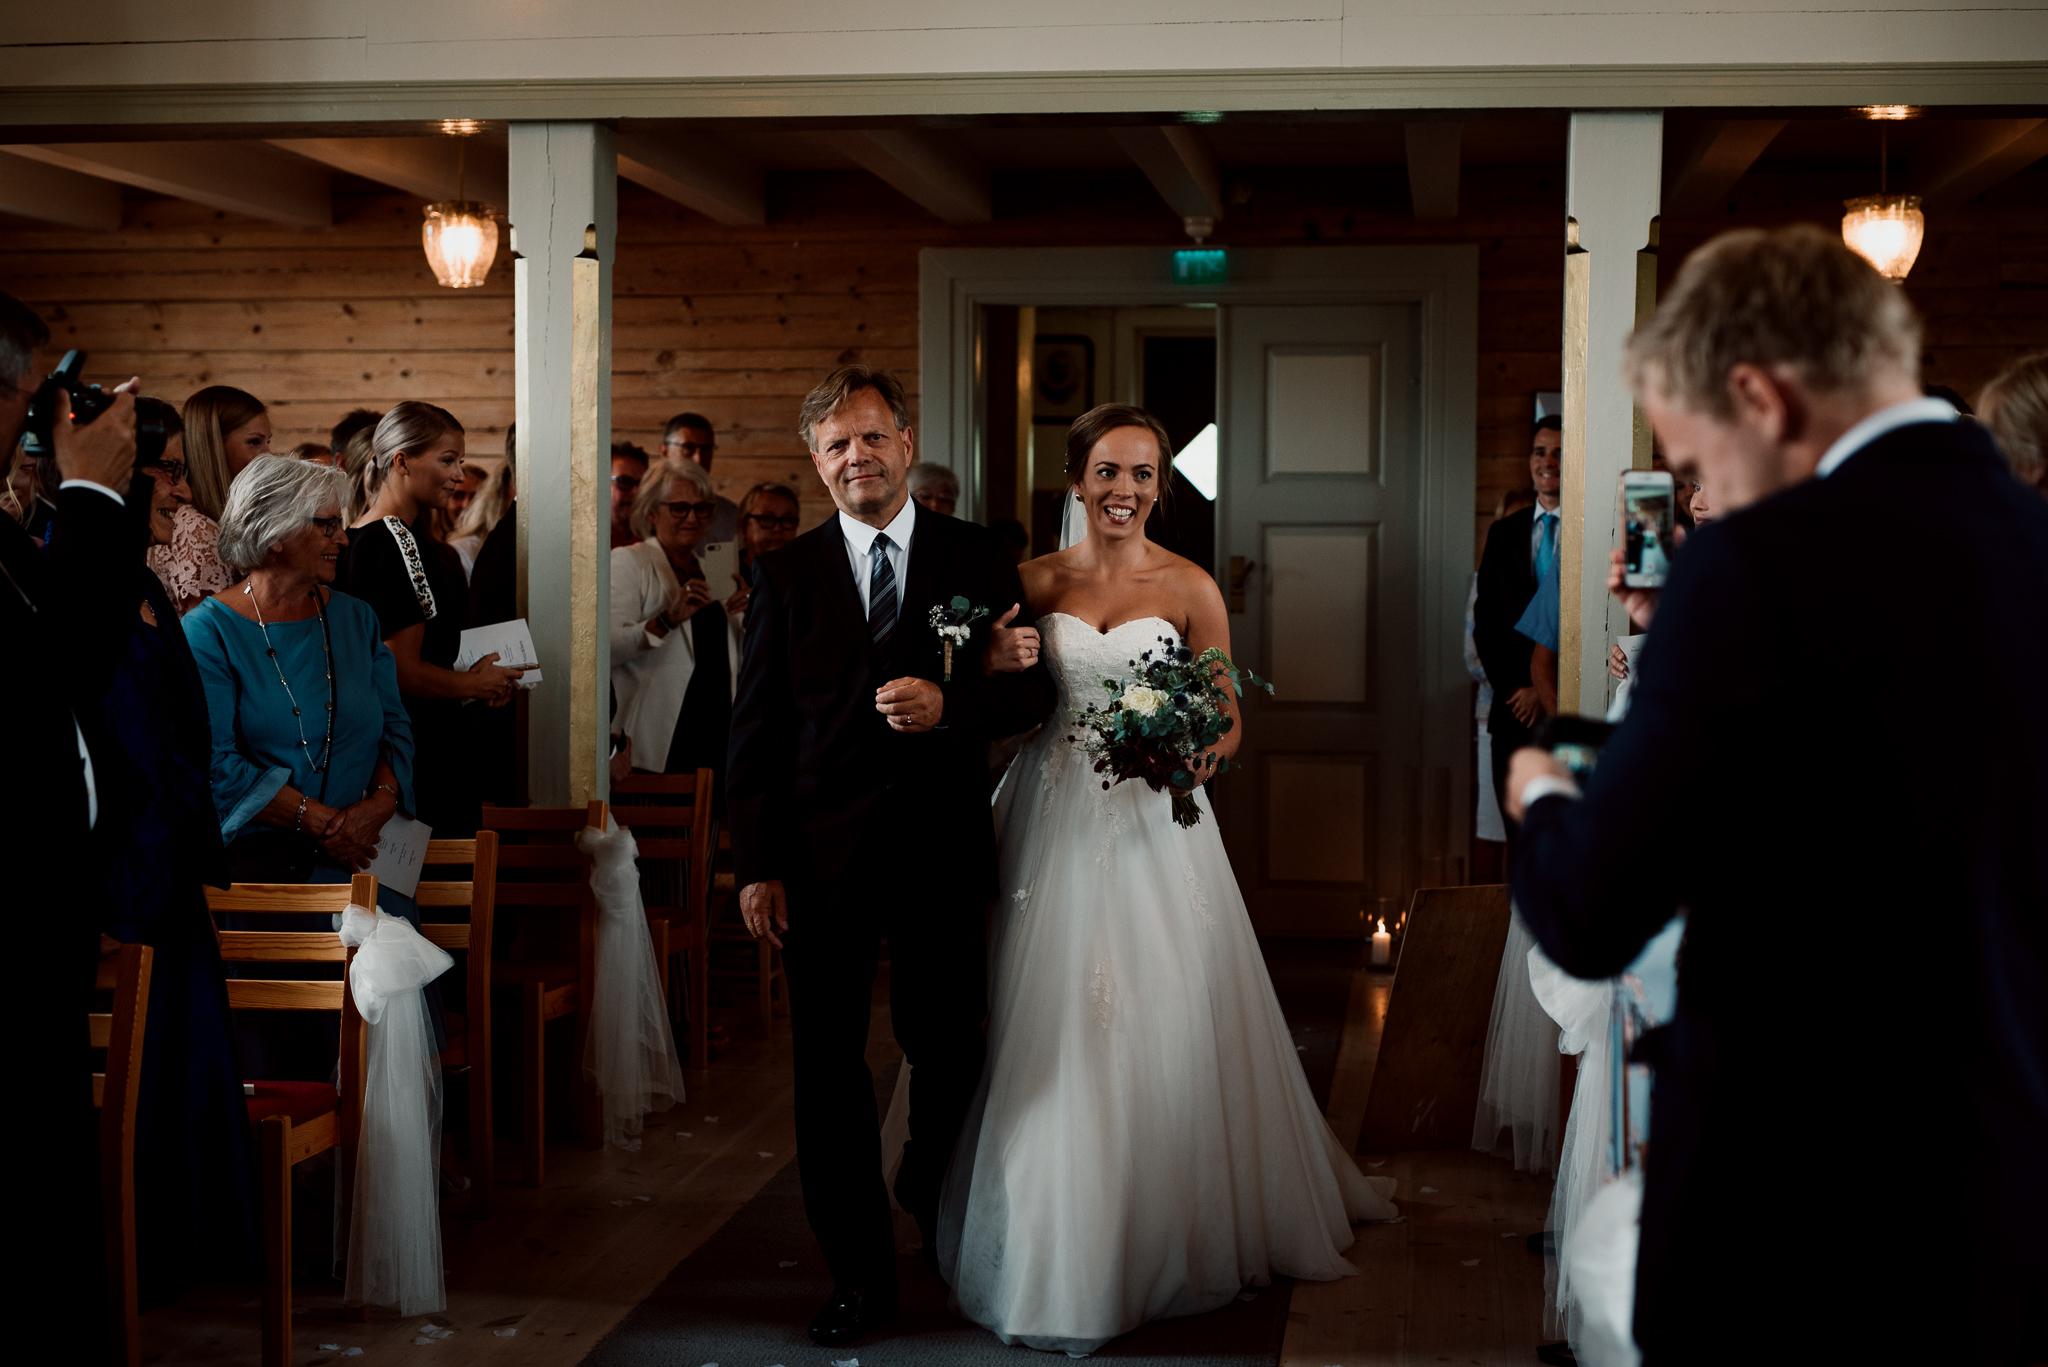 Bryllup-løen-på-sunde-bryllupsfotograf-Stavanger-Lofoten-Bergen-Oslo-17.jpg